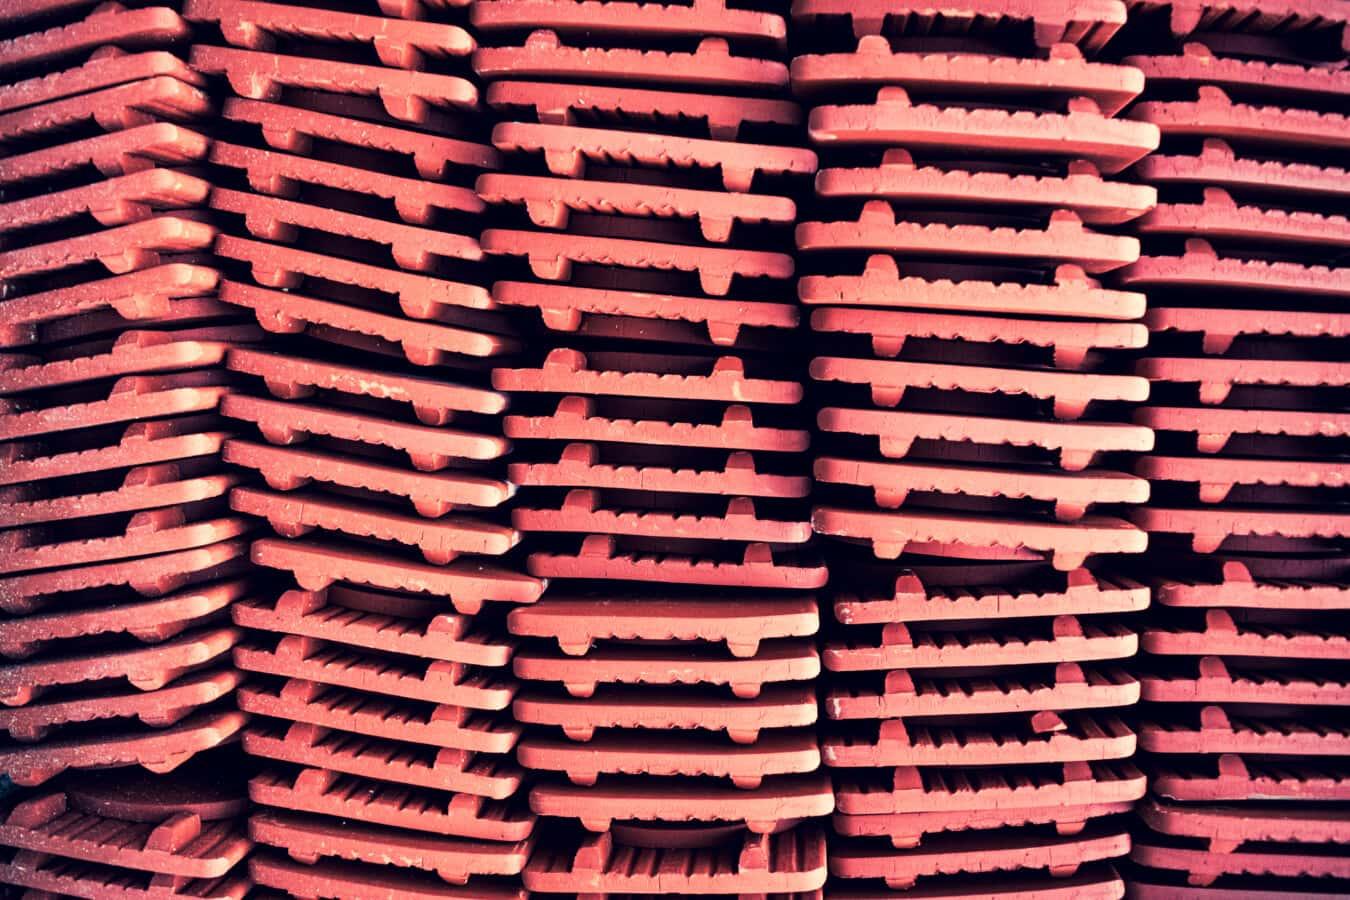 Fliesen, rötlich, Dach, Keramik, horizontal, Textur, Branche, Muster, Architektur, Stapel